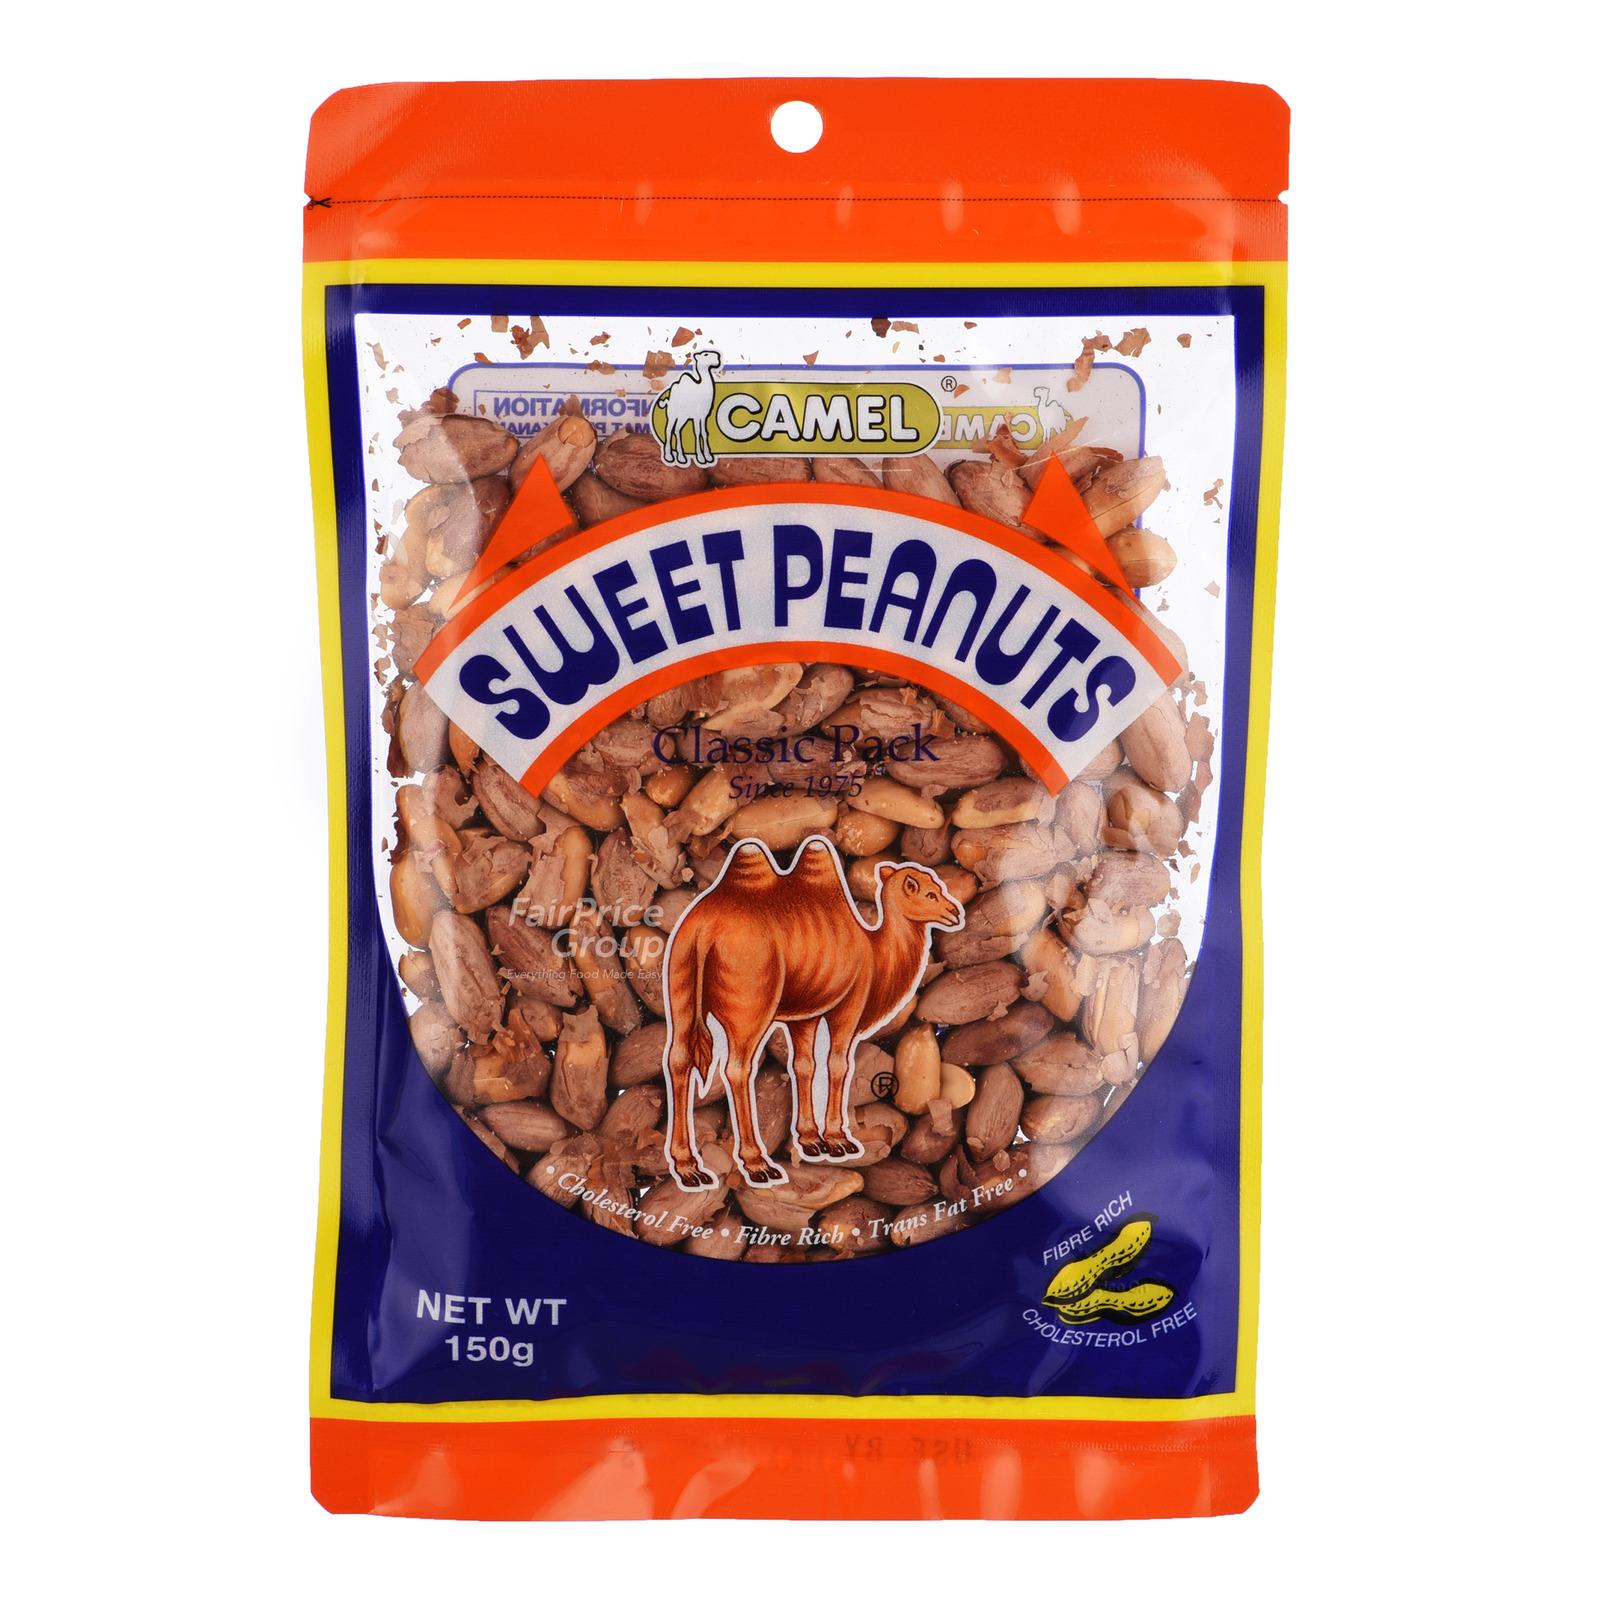 Camel Sweet Peanuts